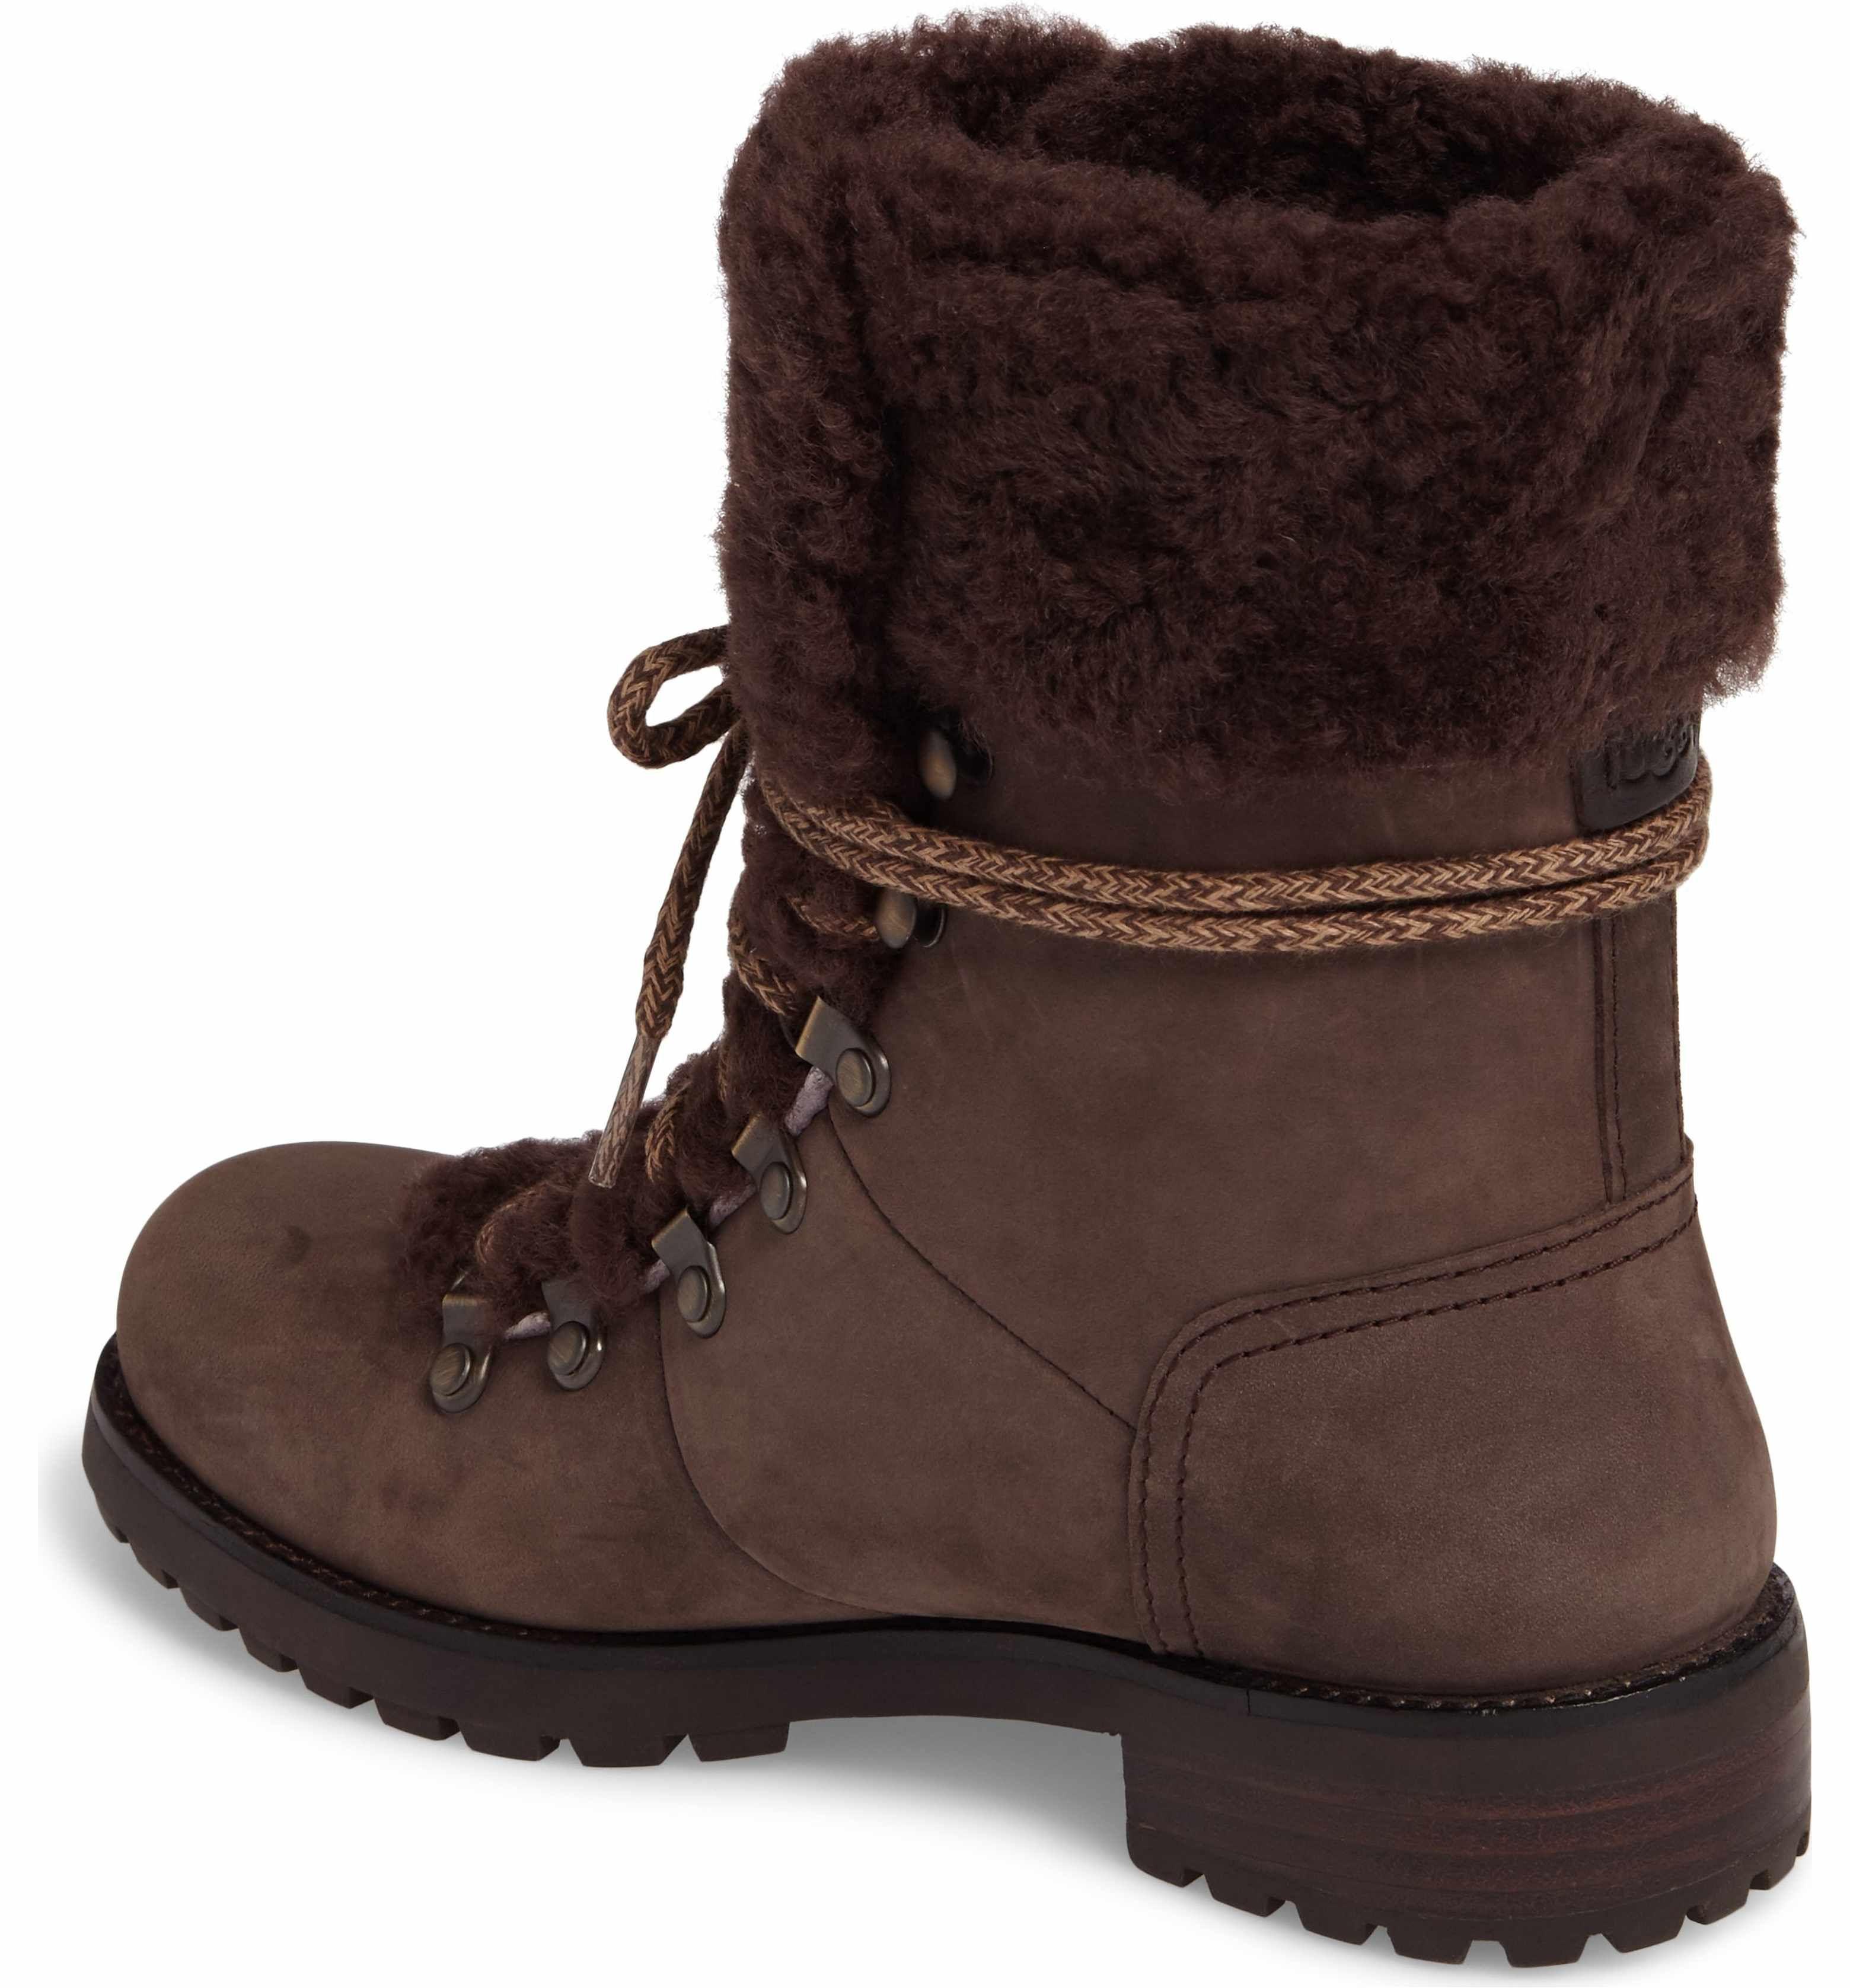 c796fd2dec8c Main Image - UGG® Fraser Genuine Shearling Water Resistant Boot (Women)